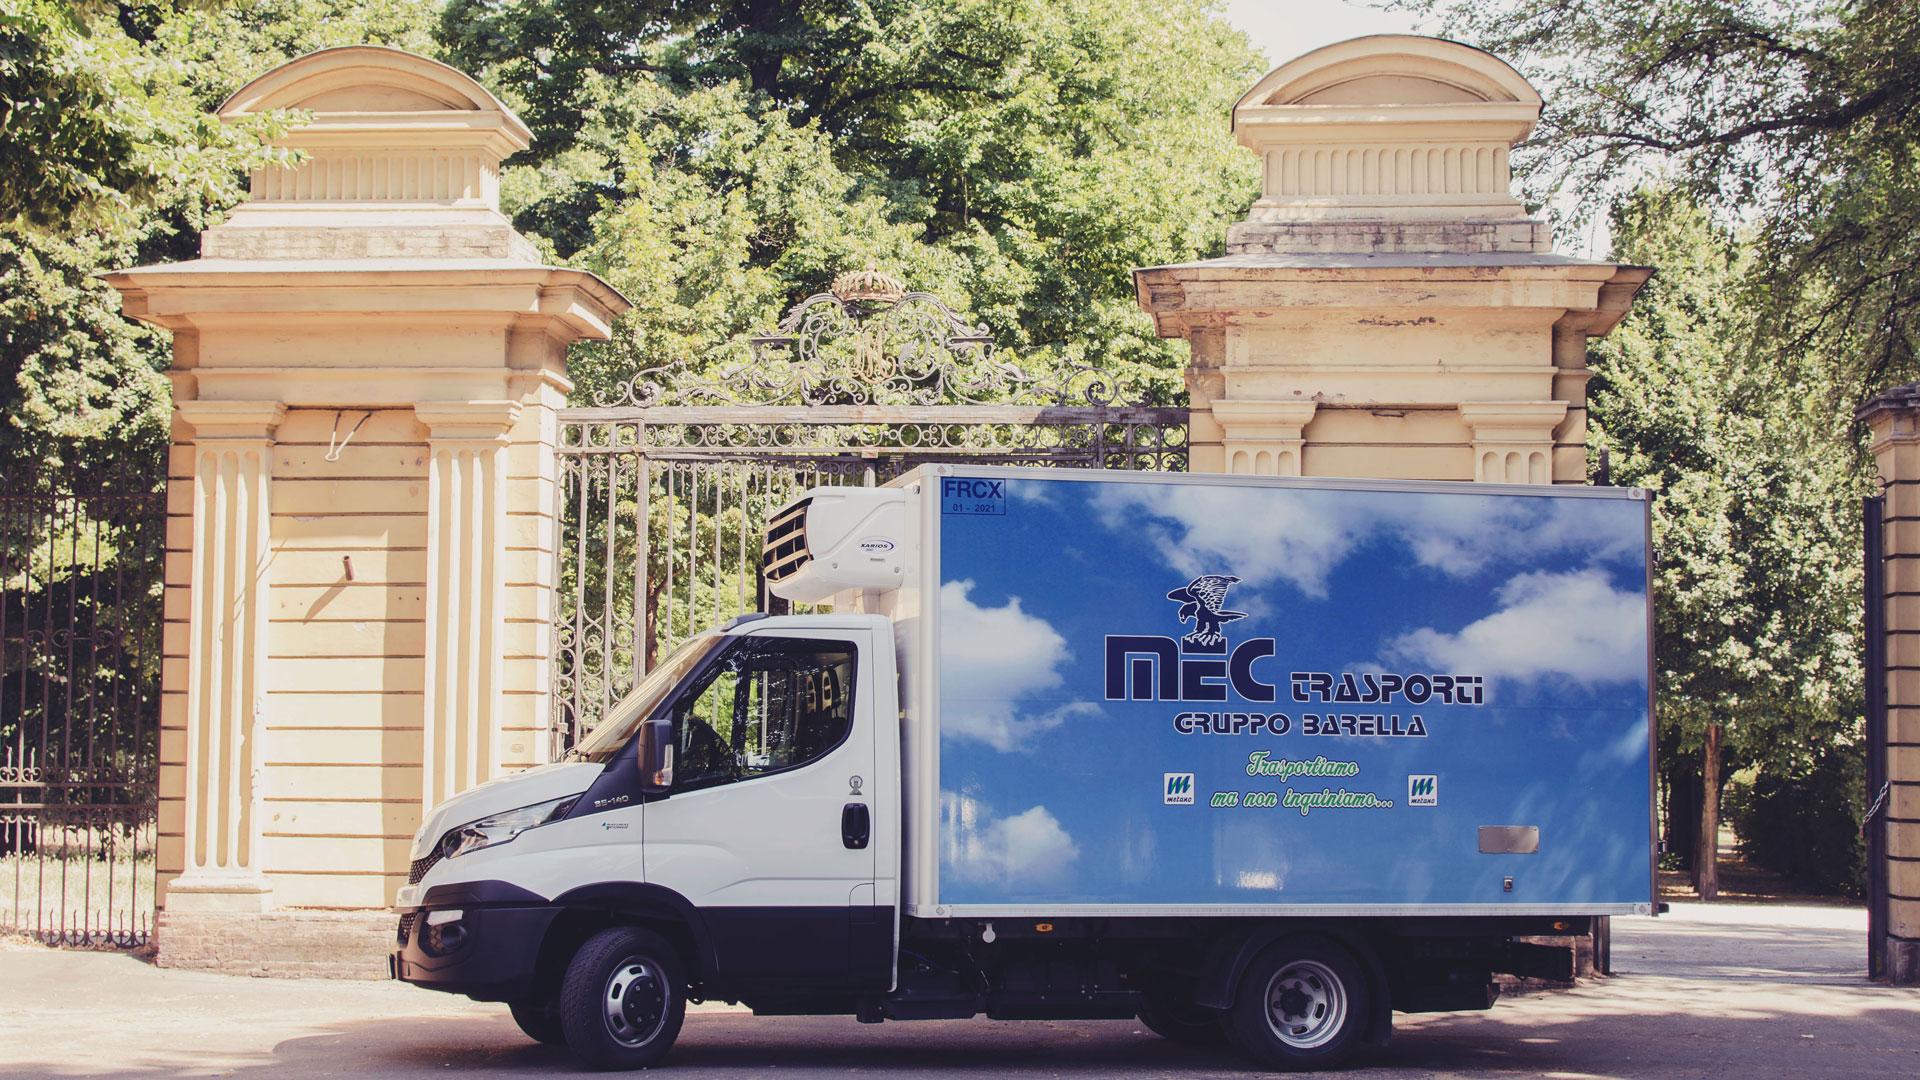 daily-metano-mec-trasporti